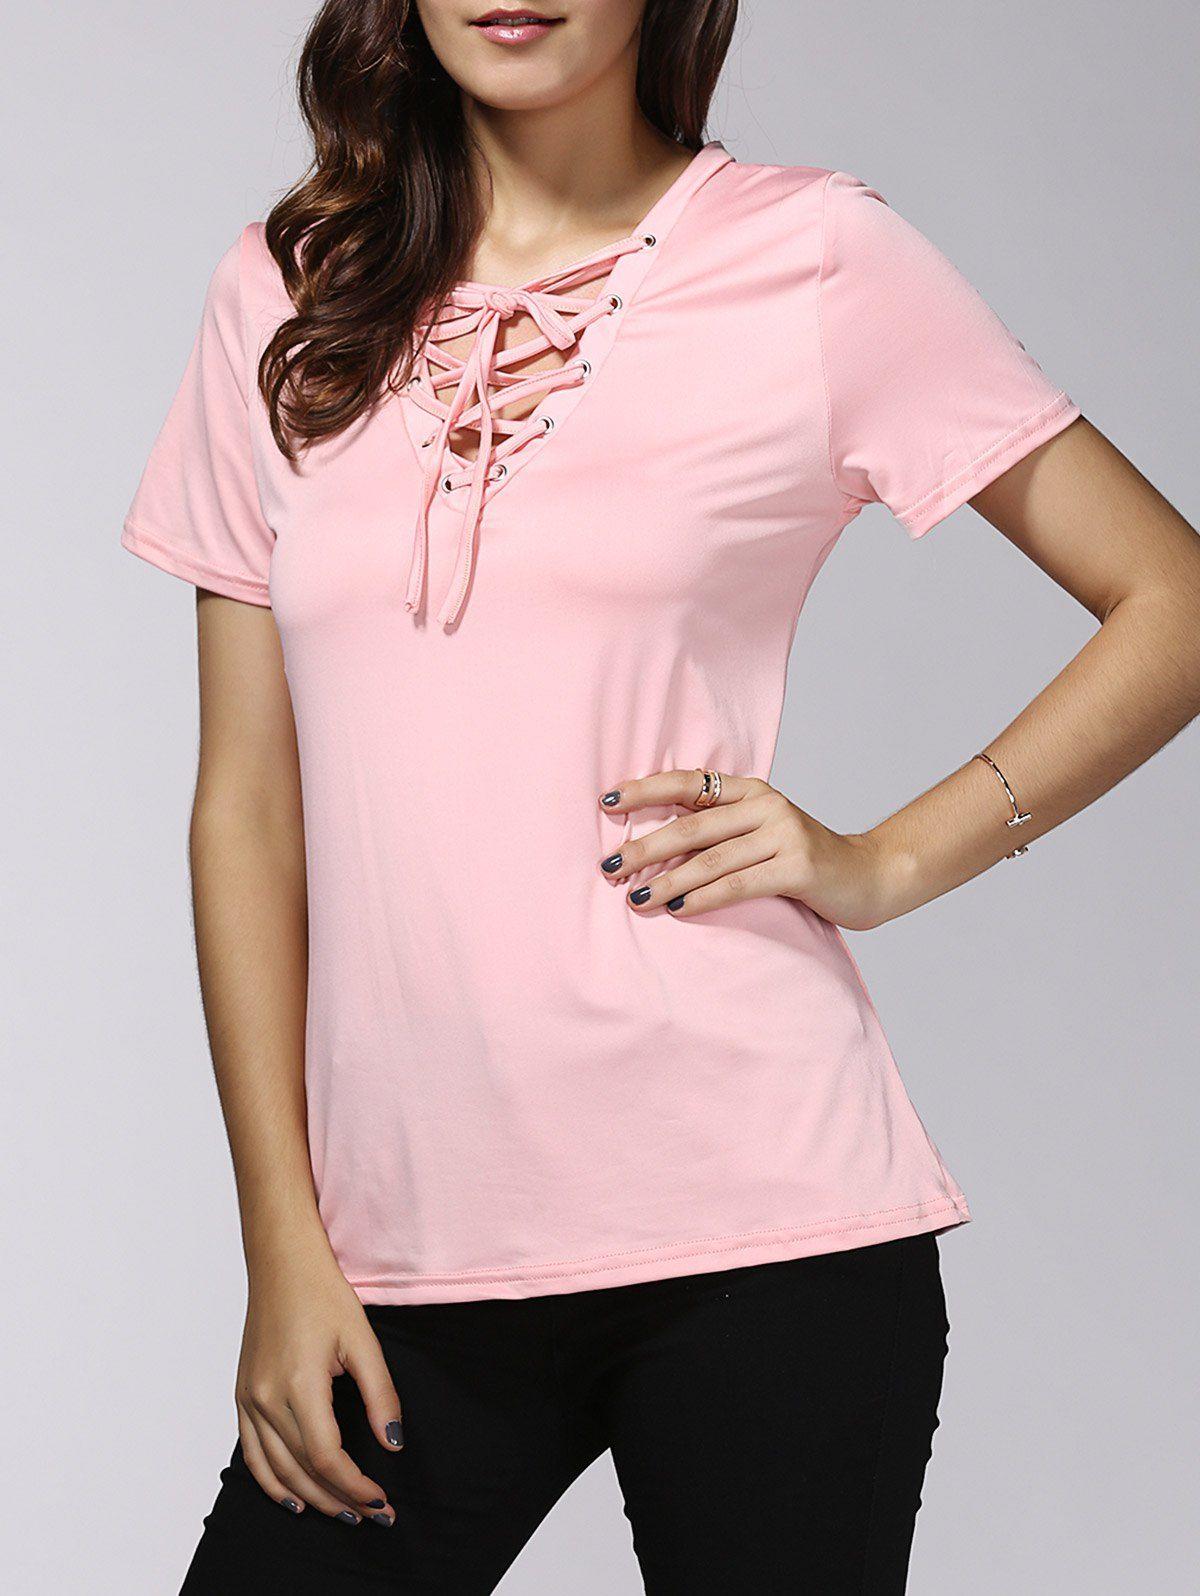 Stylish Short Sleeves V-Neck Lace-Up T-Shirt For Women